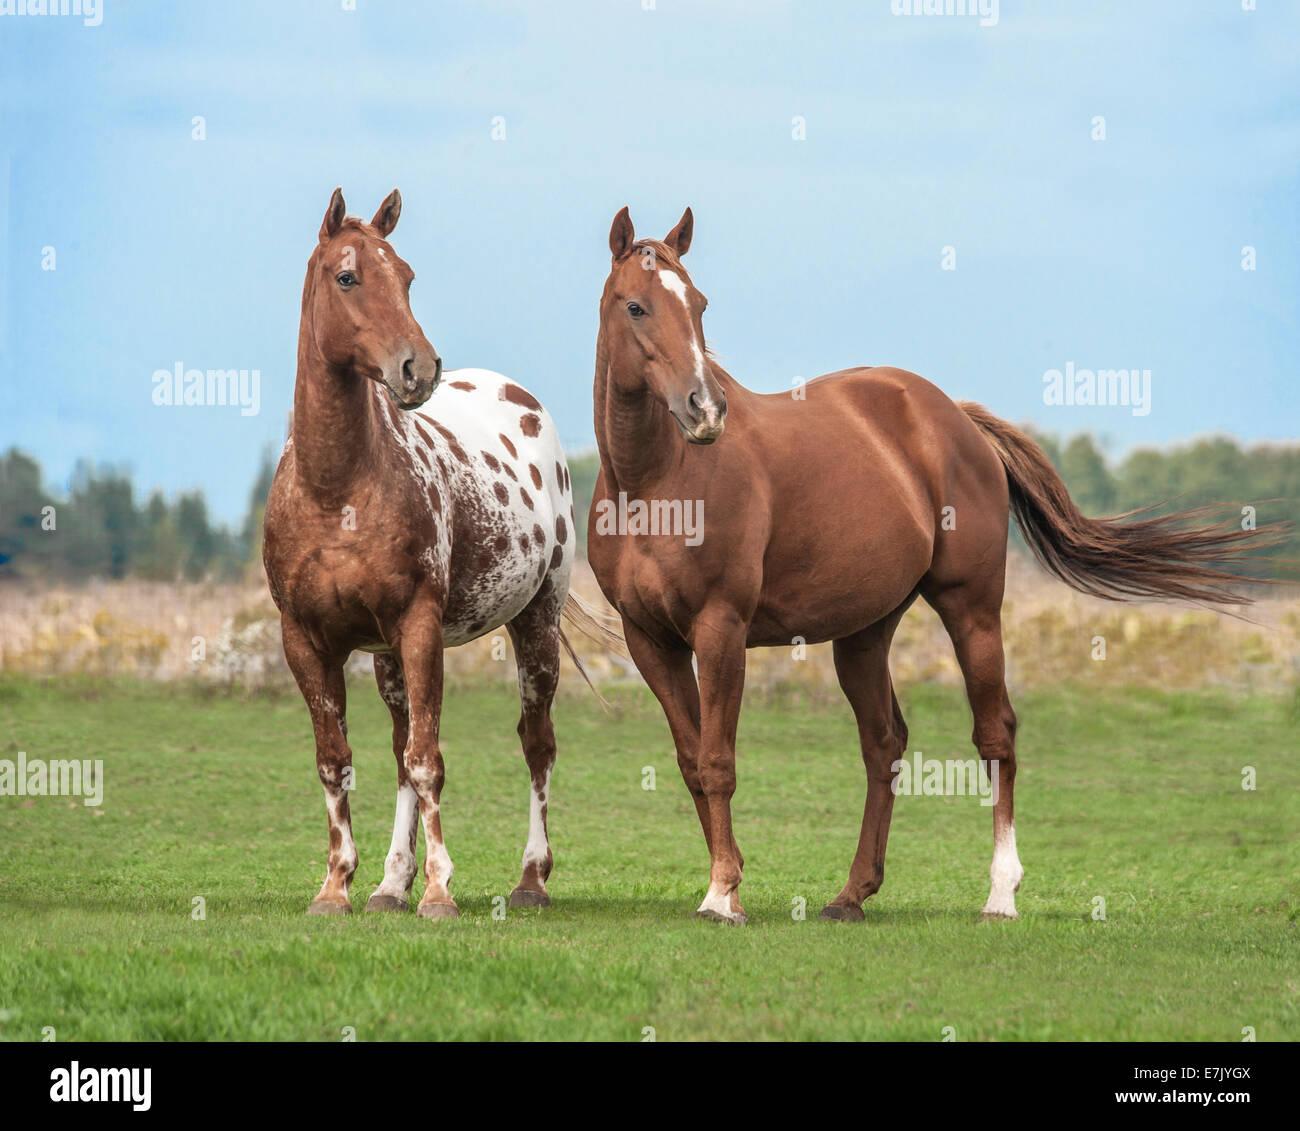 Appaloosas and Quarter horse - Stock Image